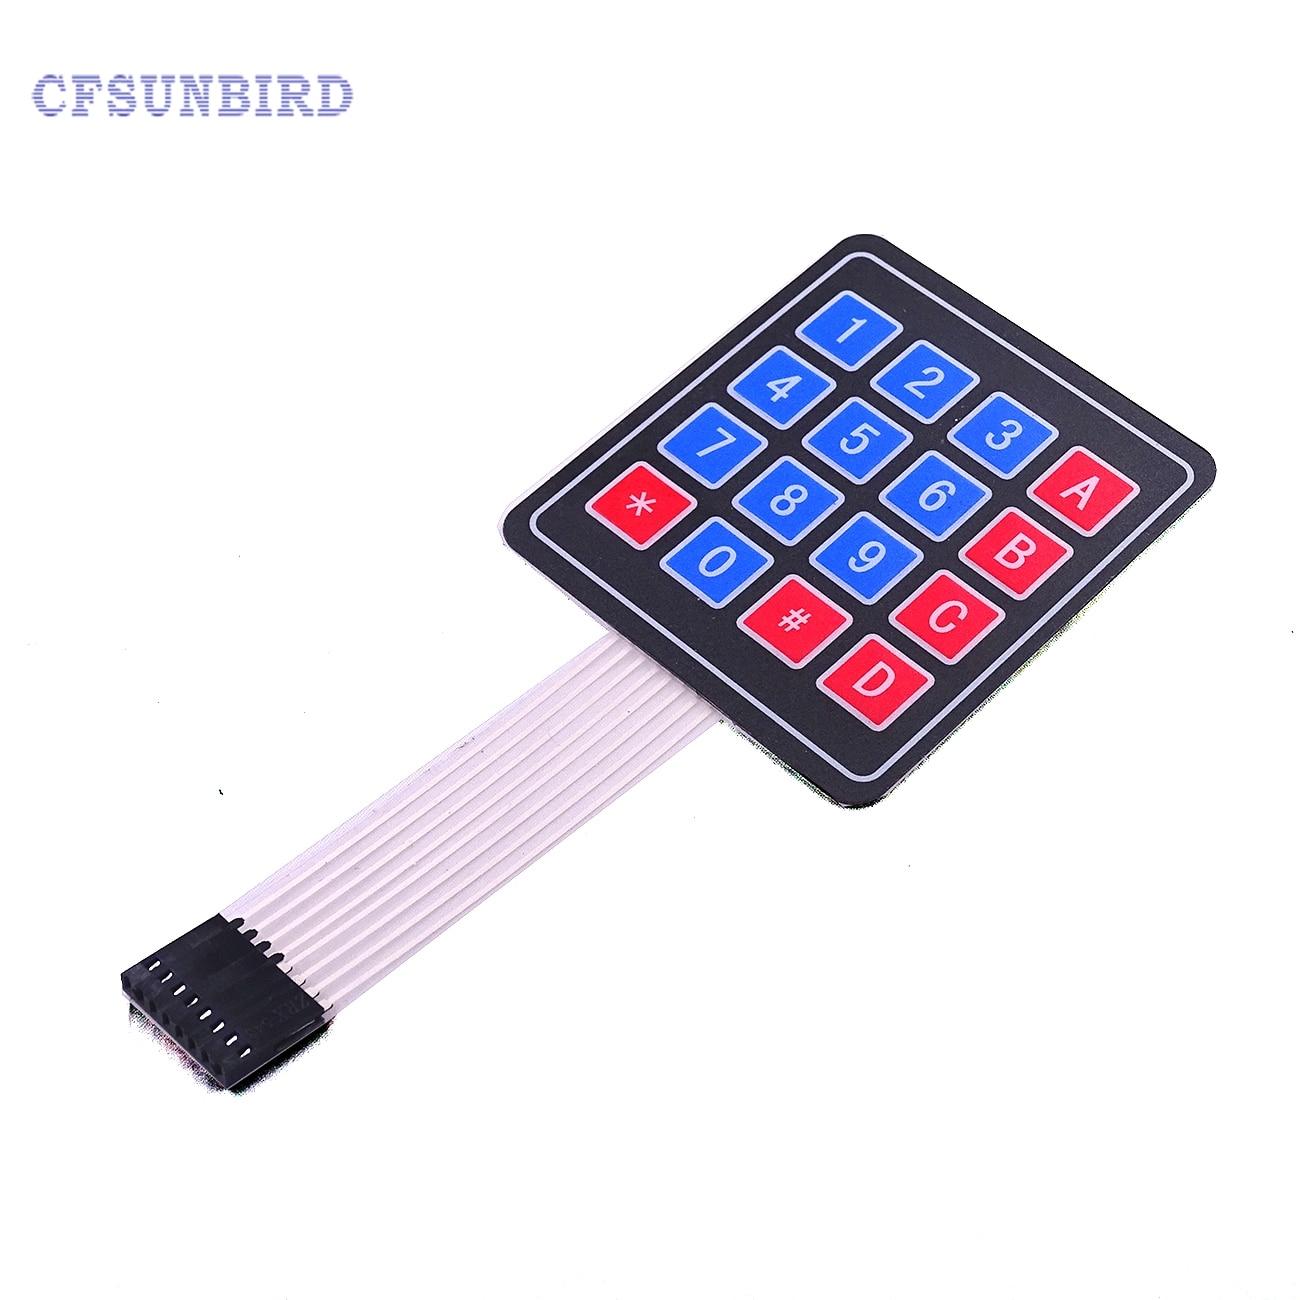 4 * 4 matrix keyboard 100PCS/LOT 16 Key Membrane Switch Keypad 4 x 4 Matrix Array Matrix keyboard for arduino laptop keyboard for hp for envy 4 1014tu 4 1014tx 4 1015tu 4 1015tx 4 1018tu backlit northwest africa 692759 fp1 mp 11m6j698w